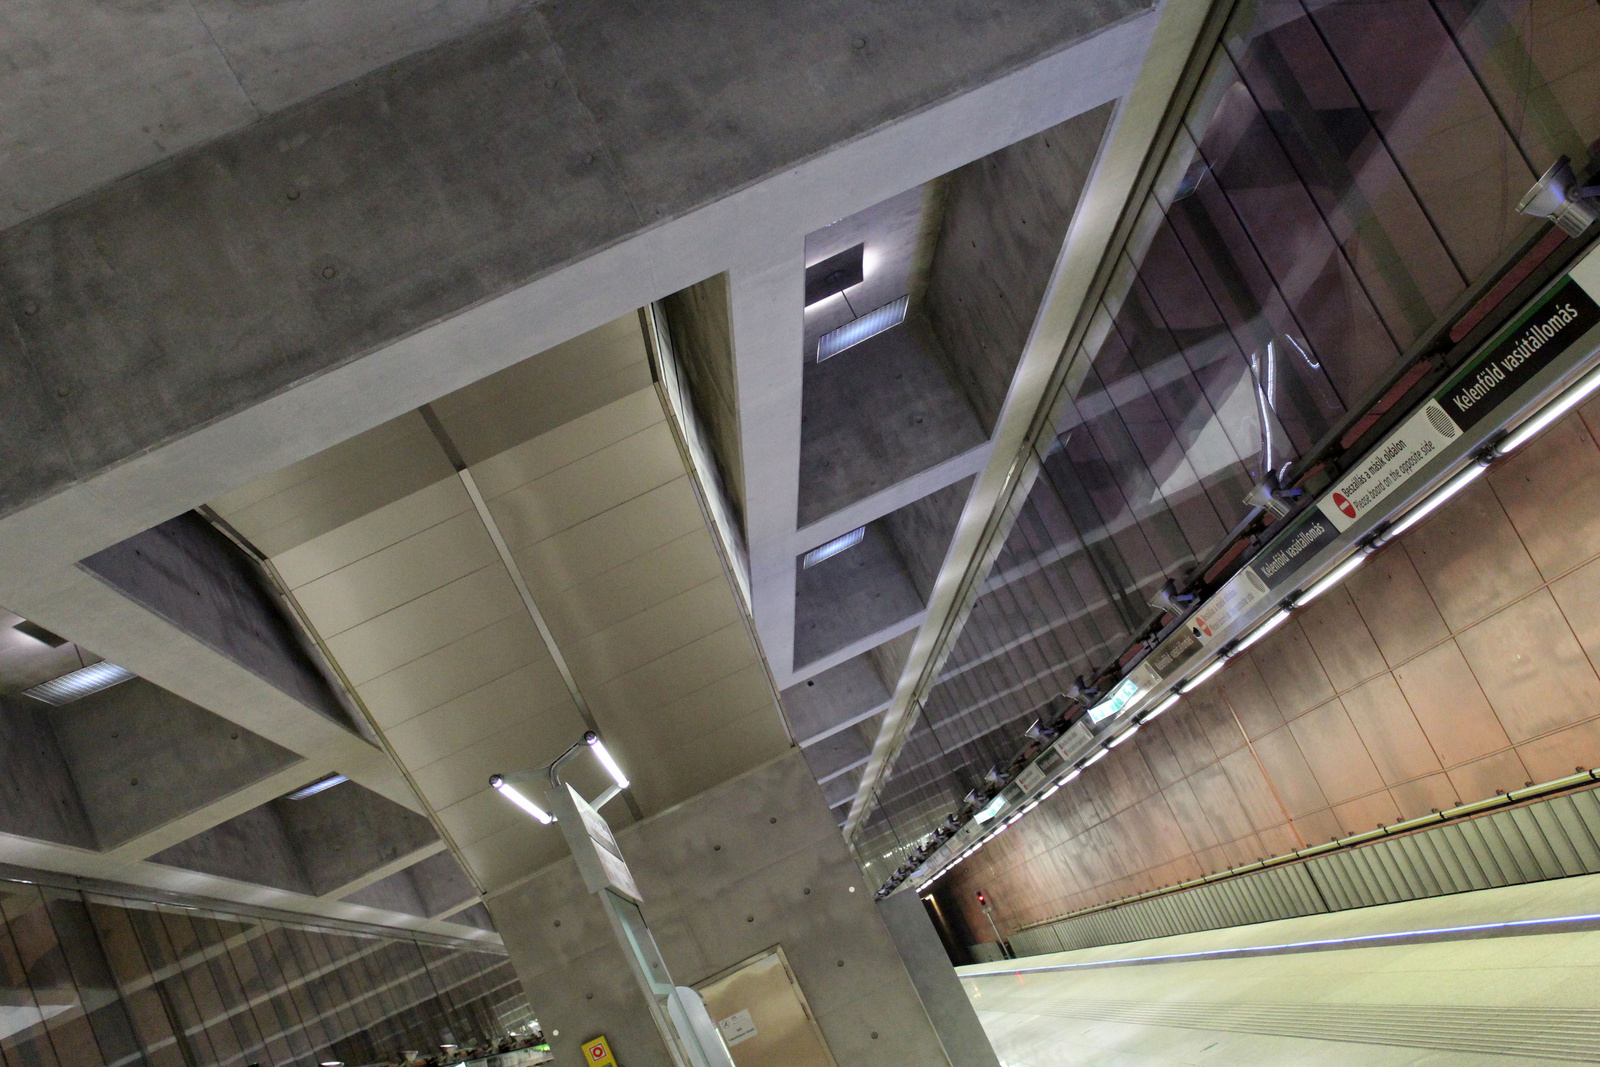 Metro4-KelenfoldVasutallomas-20150817-06